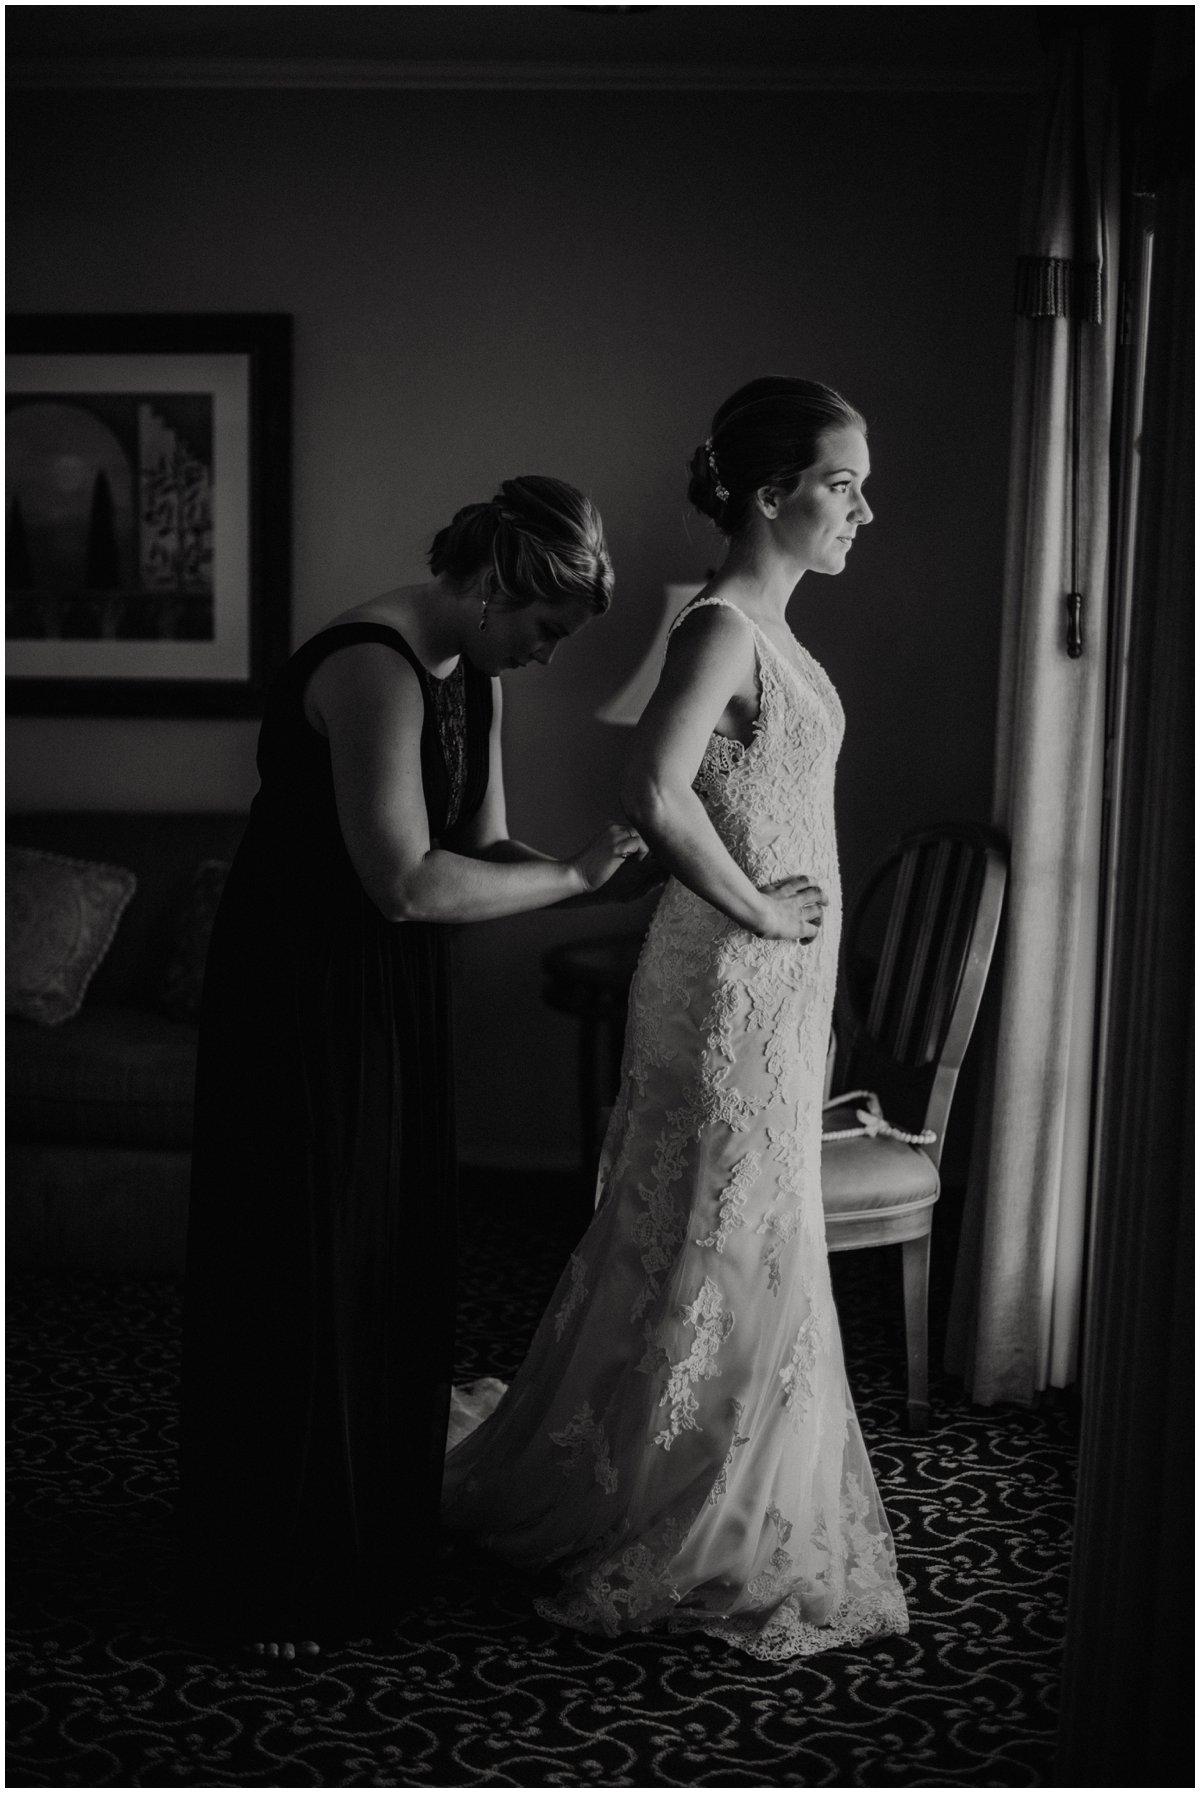 Classic and Elegant Scottsdale Wedding Photos at McCormick Ranch Golf Club in Scottsdale, Arizona.